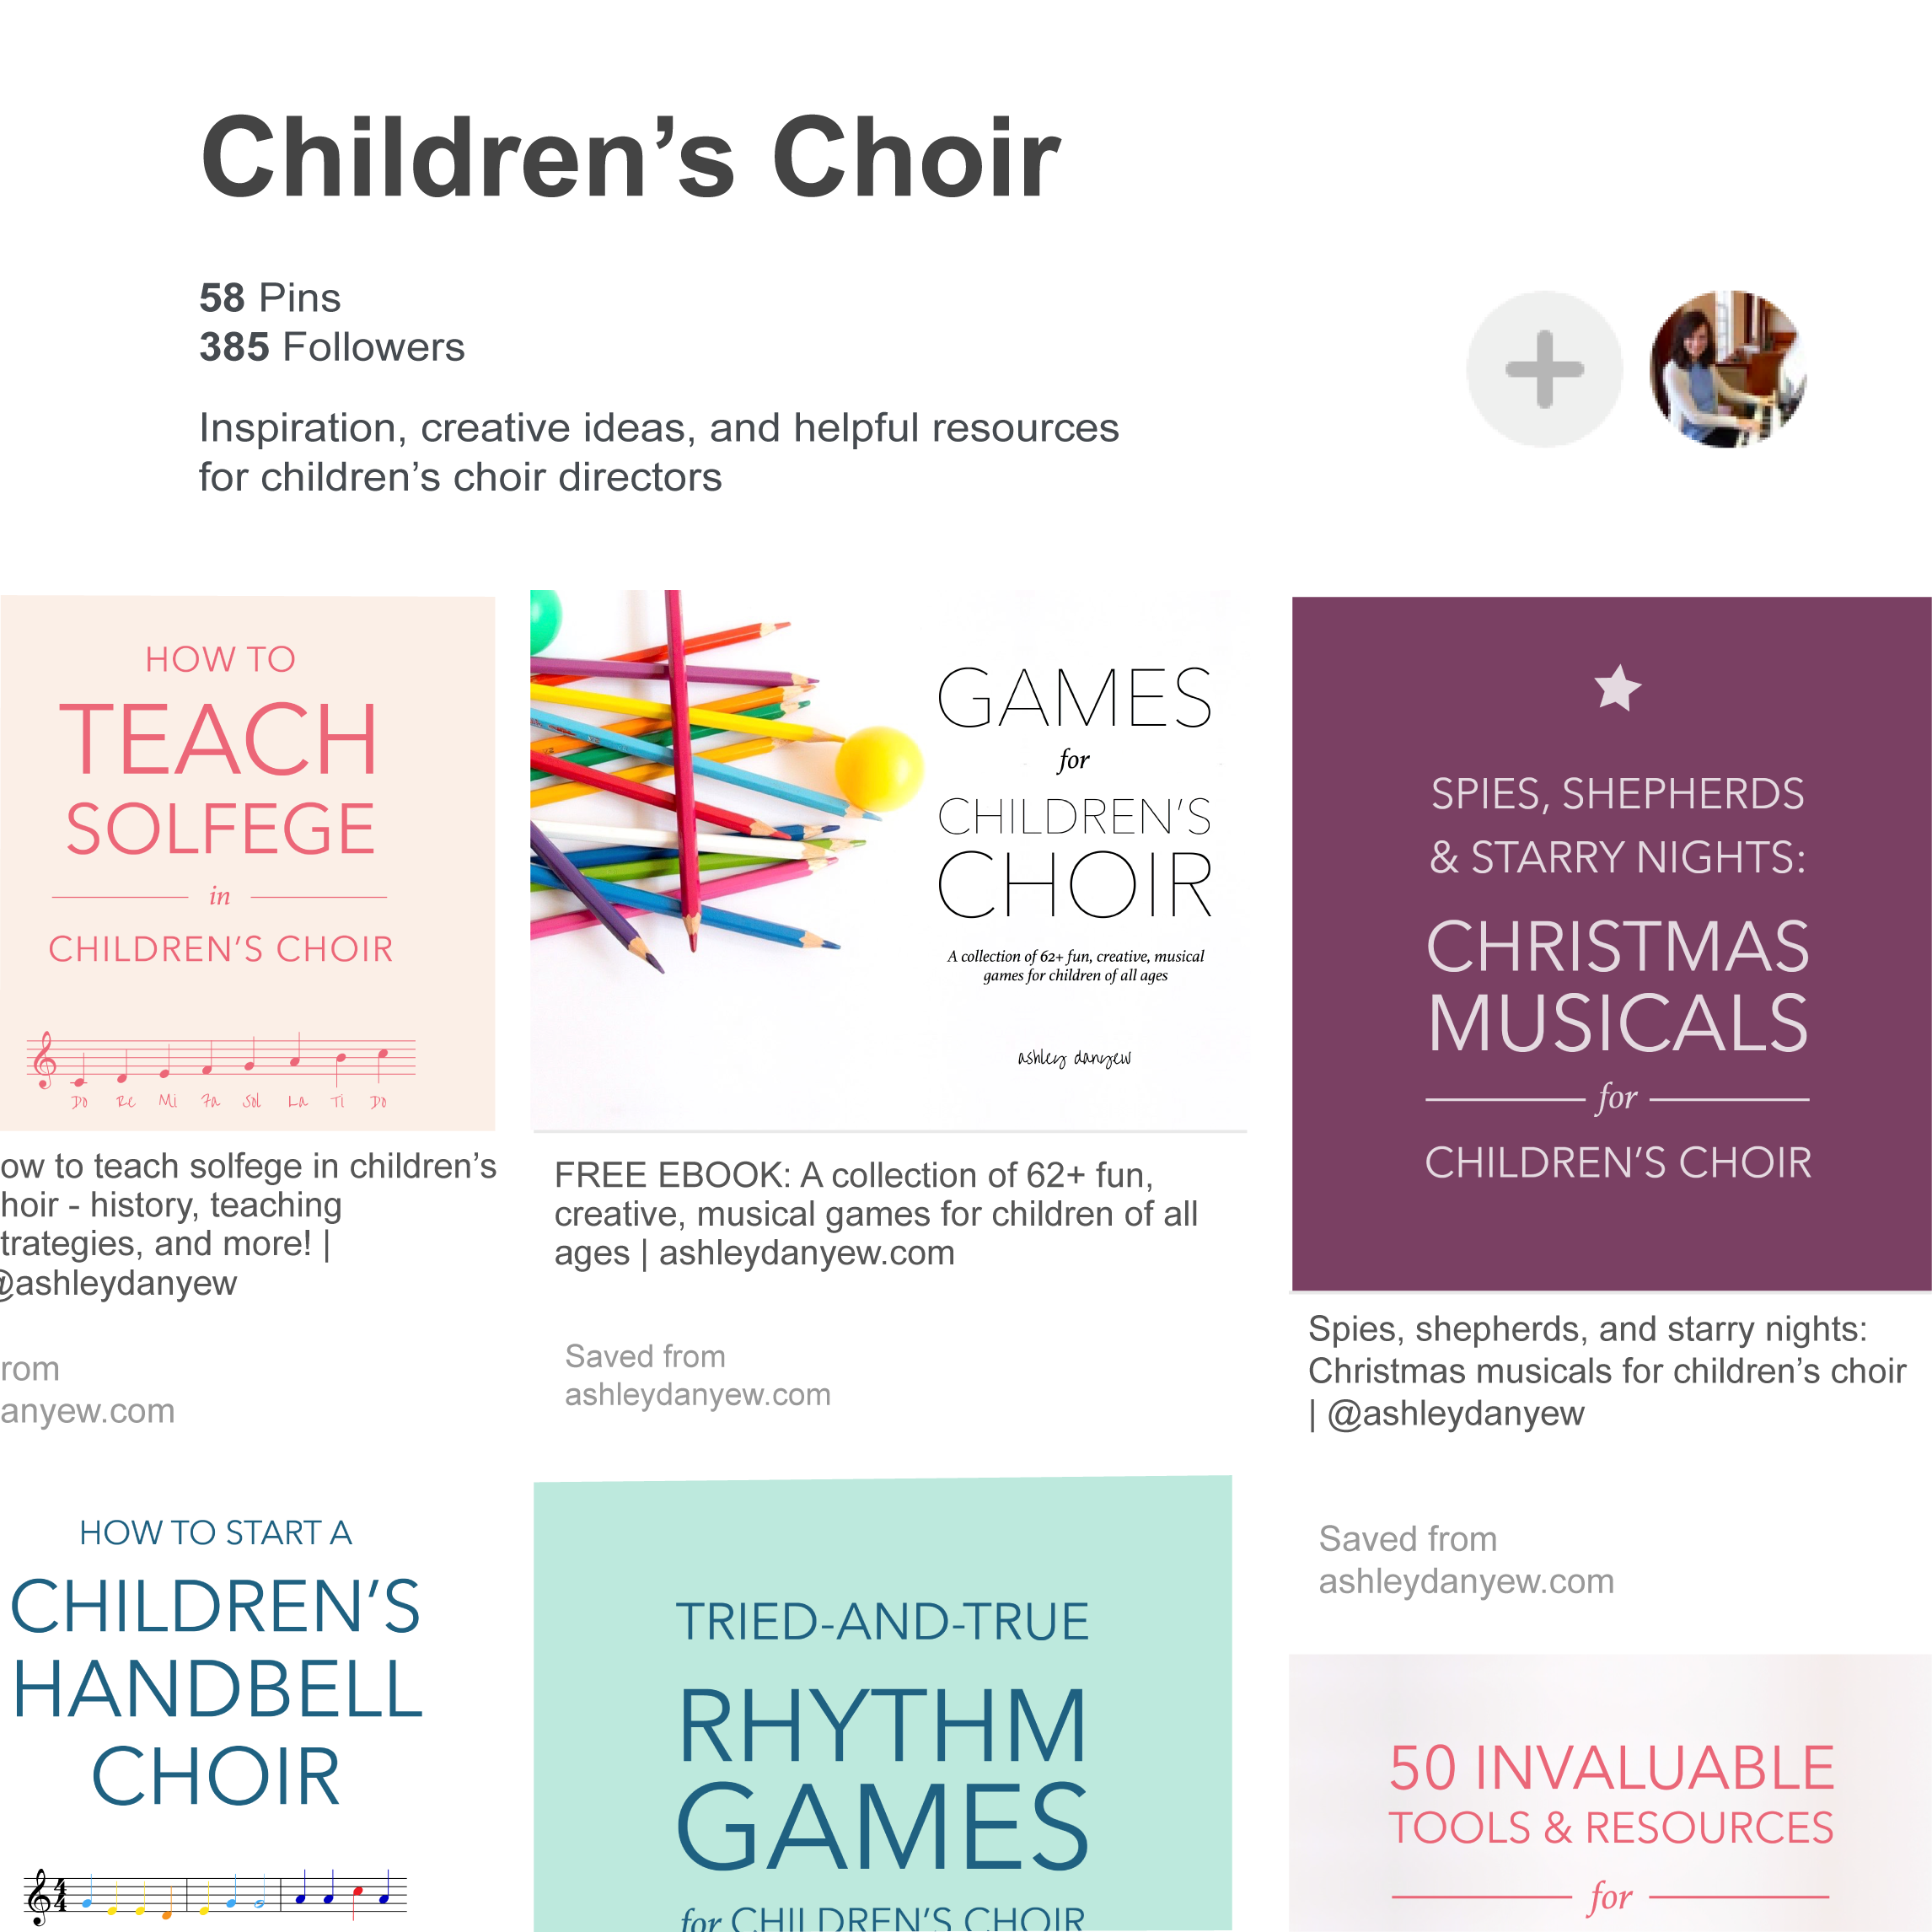 My Favorite Pinterest Boards for Children's Choir | @ashleydanyew